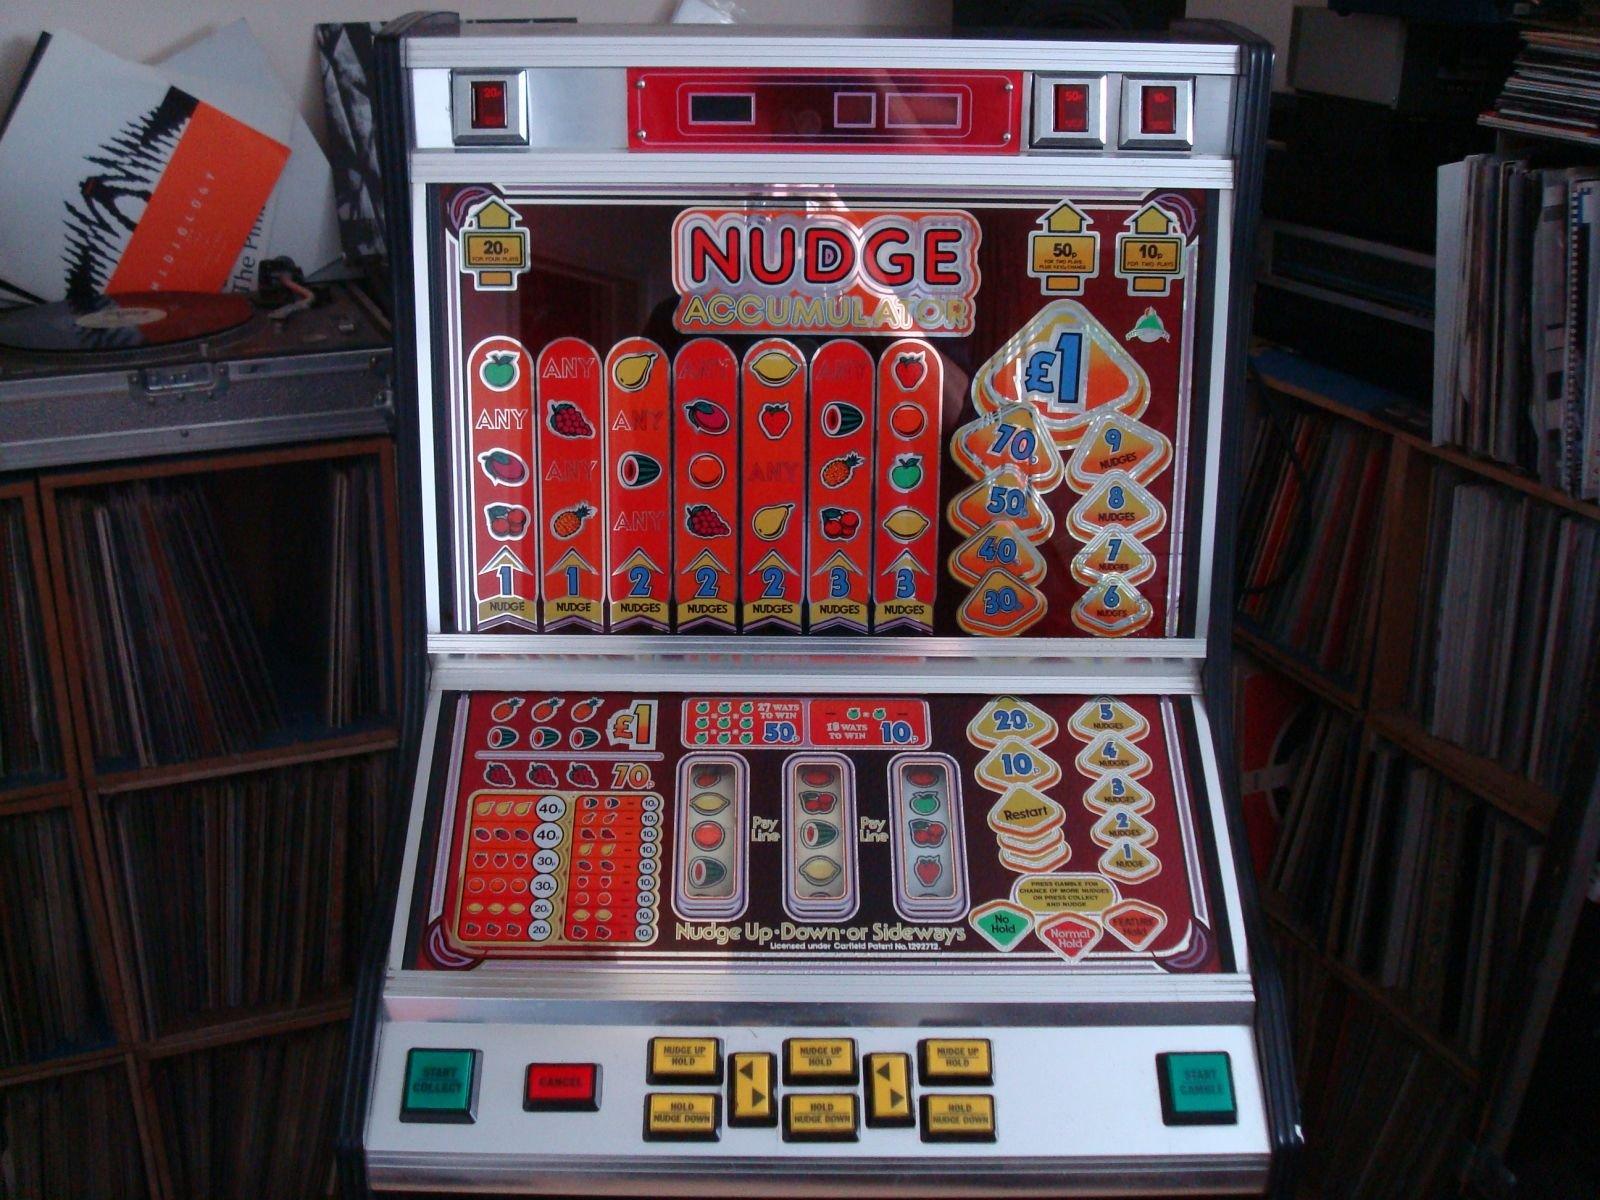 nudge accumulator.jpg